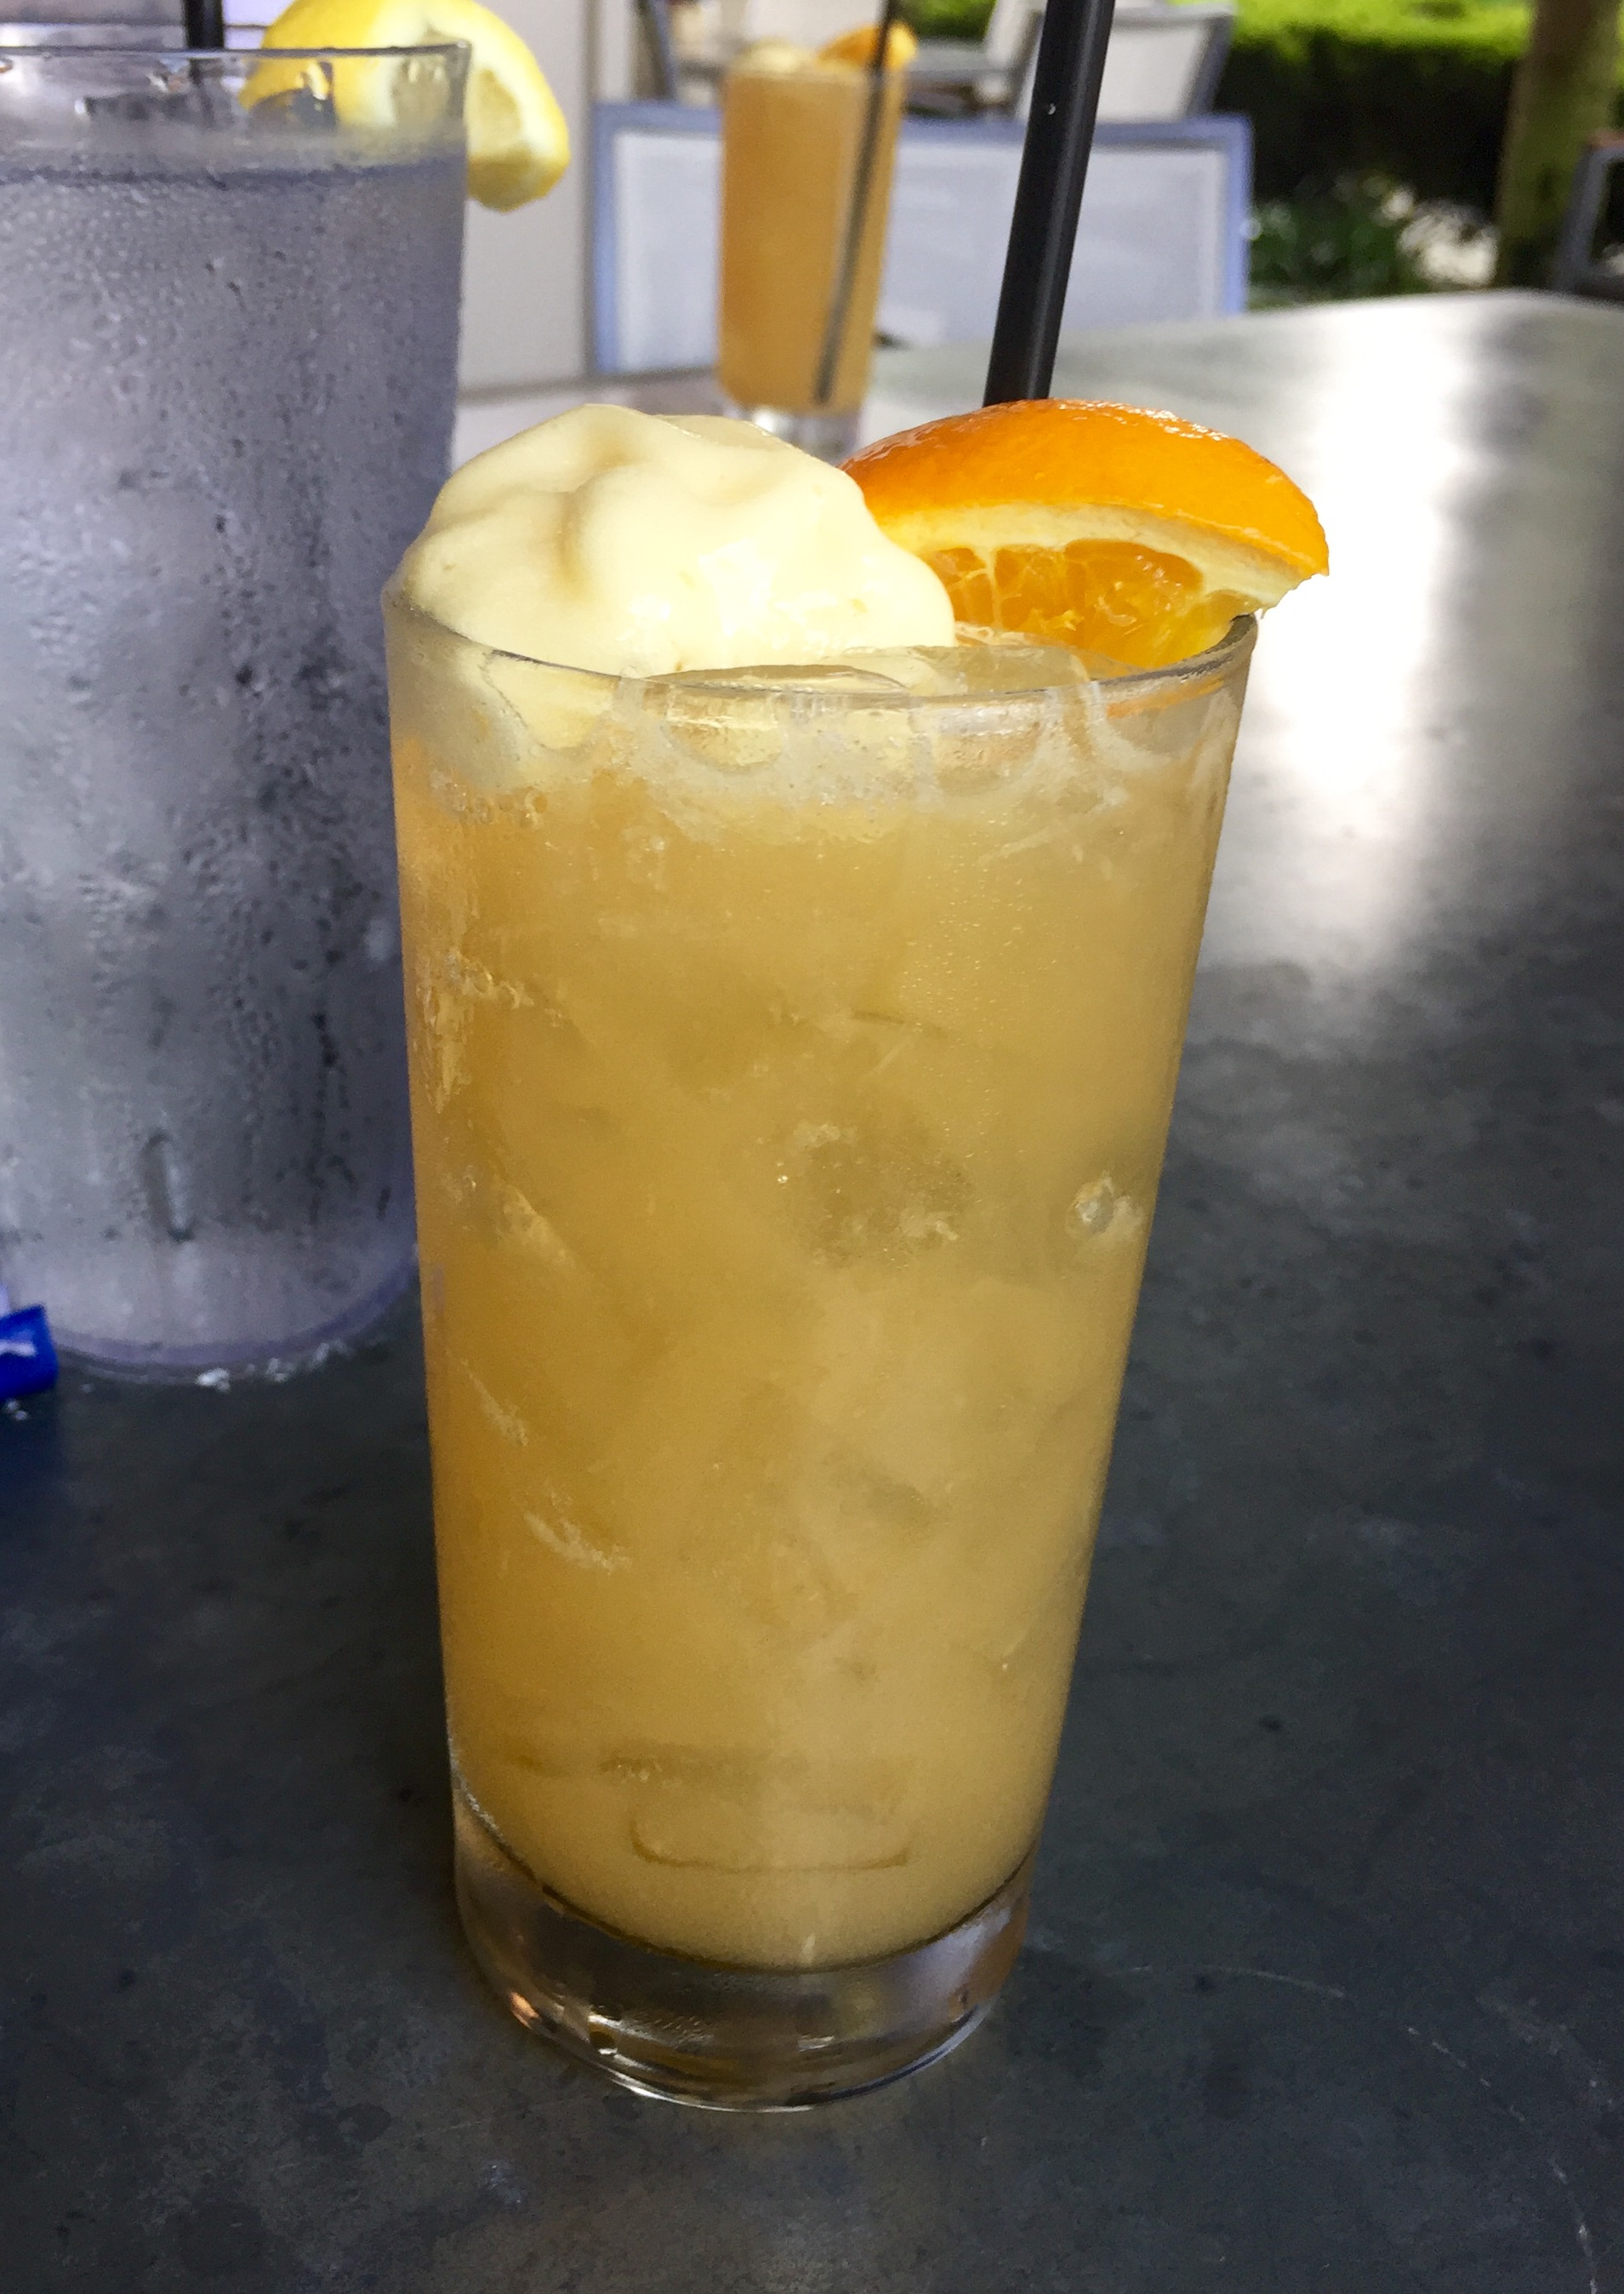 Best Margarita recipe at a restaurant